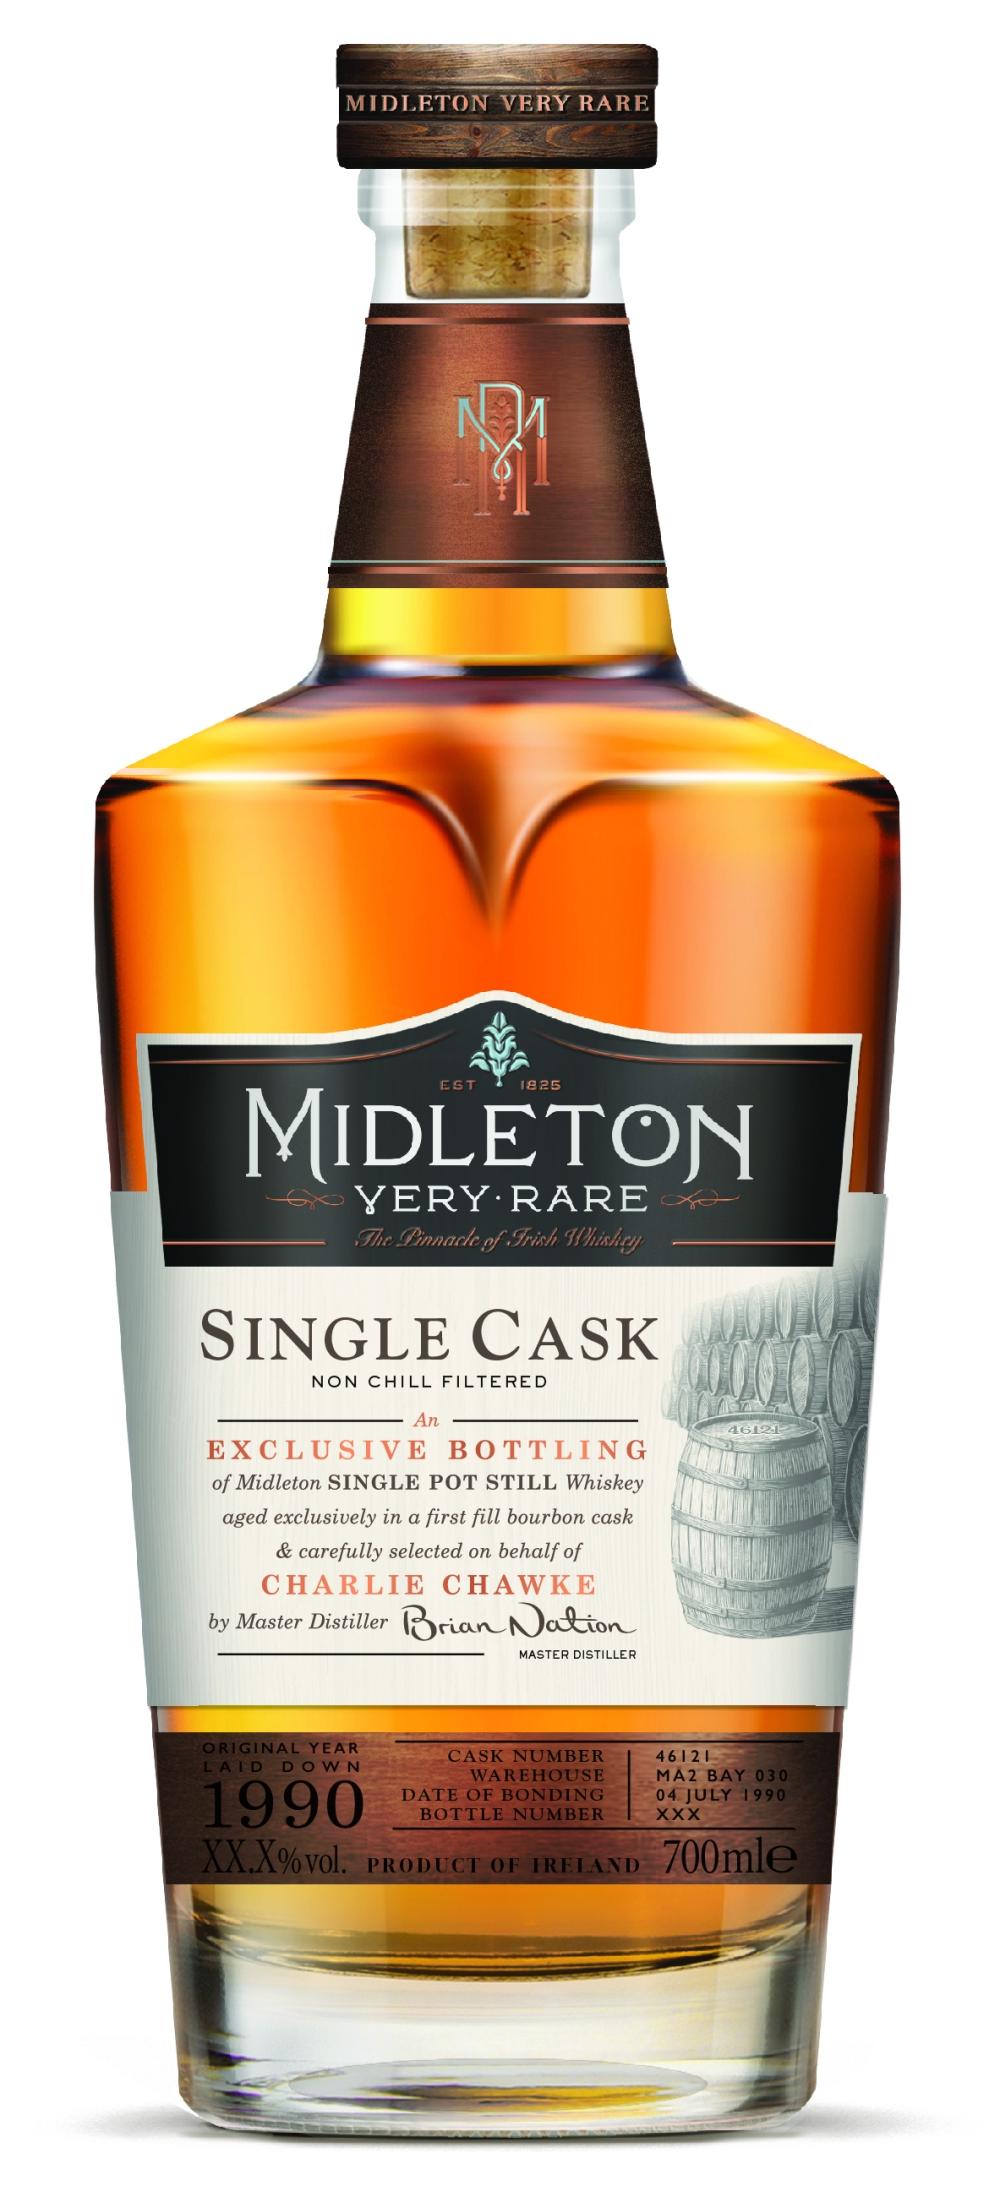 20190314_Midleton_Single Cask-01